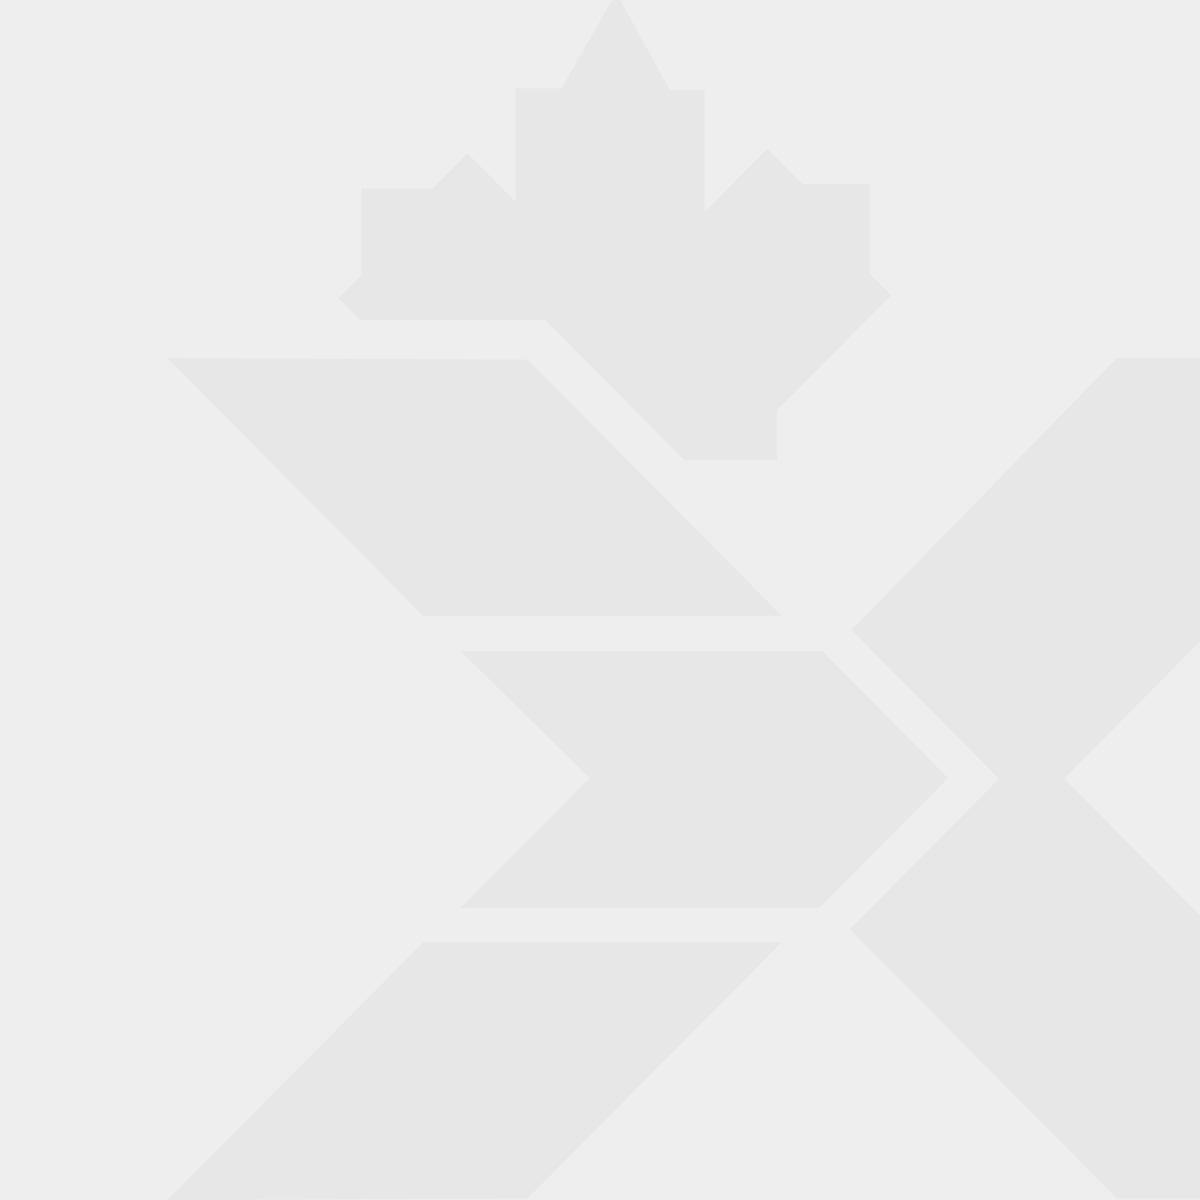 Ashley Linebacker DuraBlend® Recliner (95202-25)